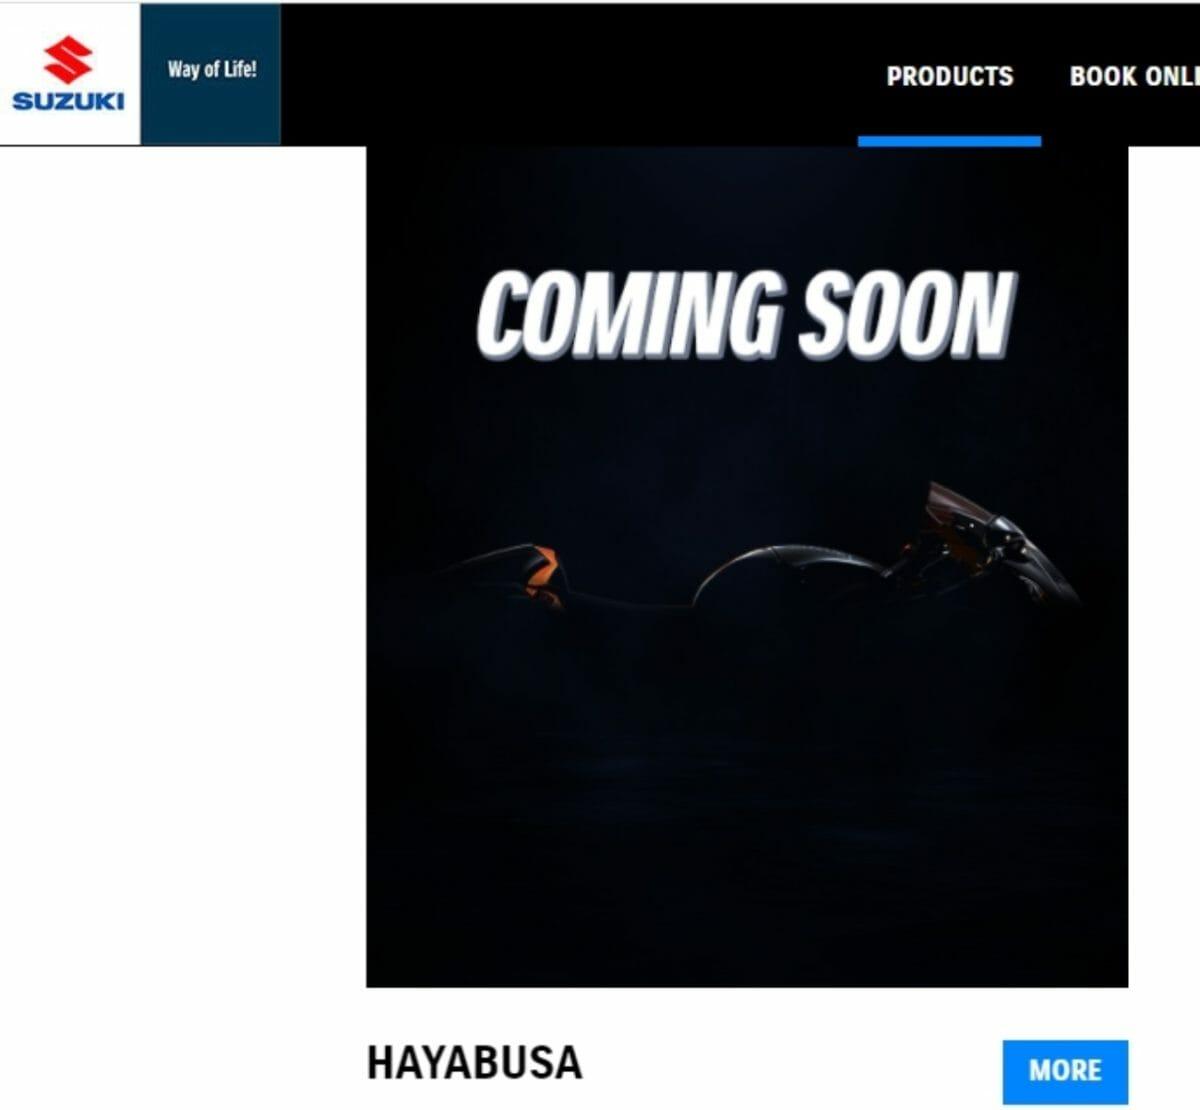 Suzuki hayabusa website listing